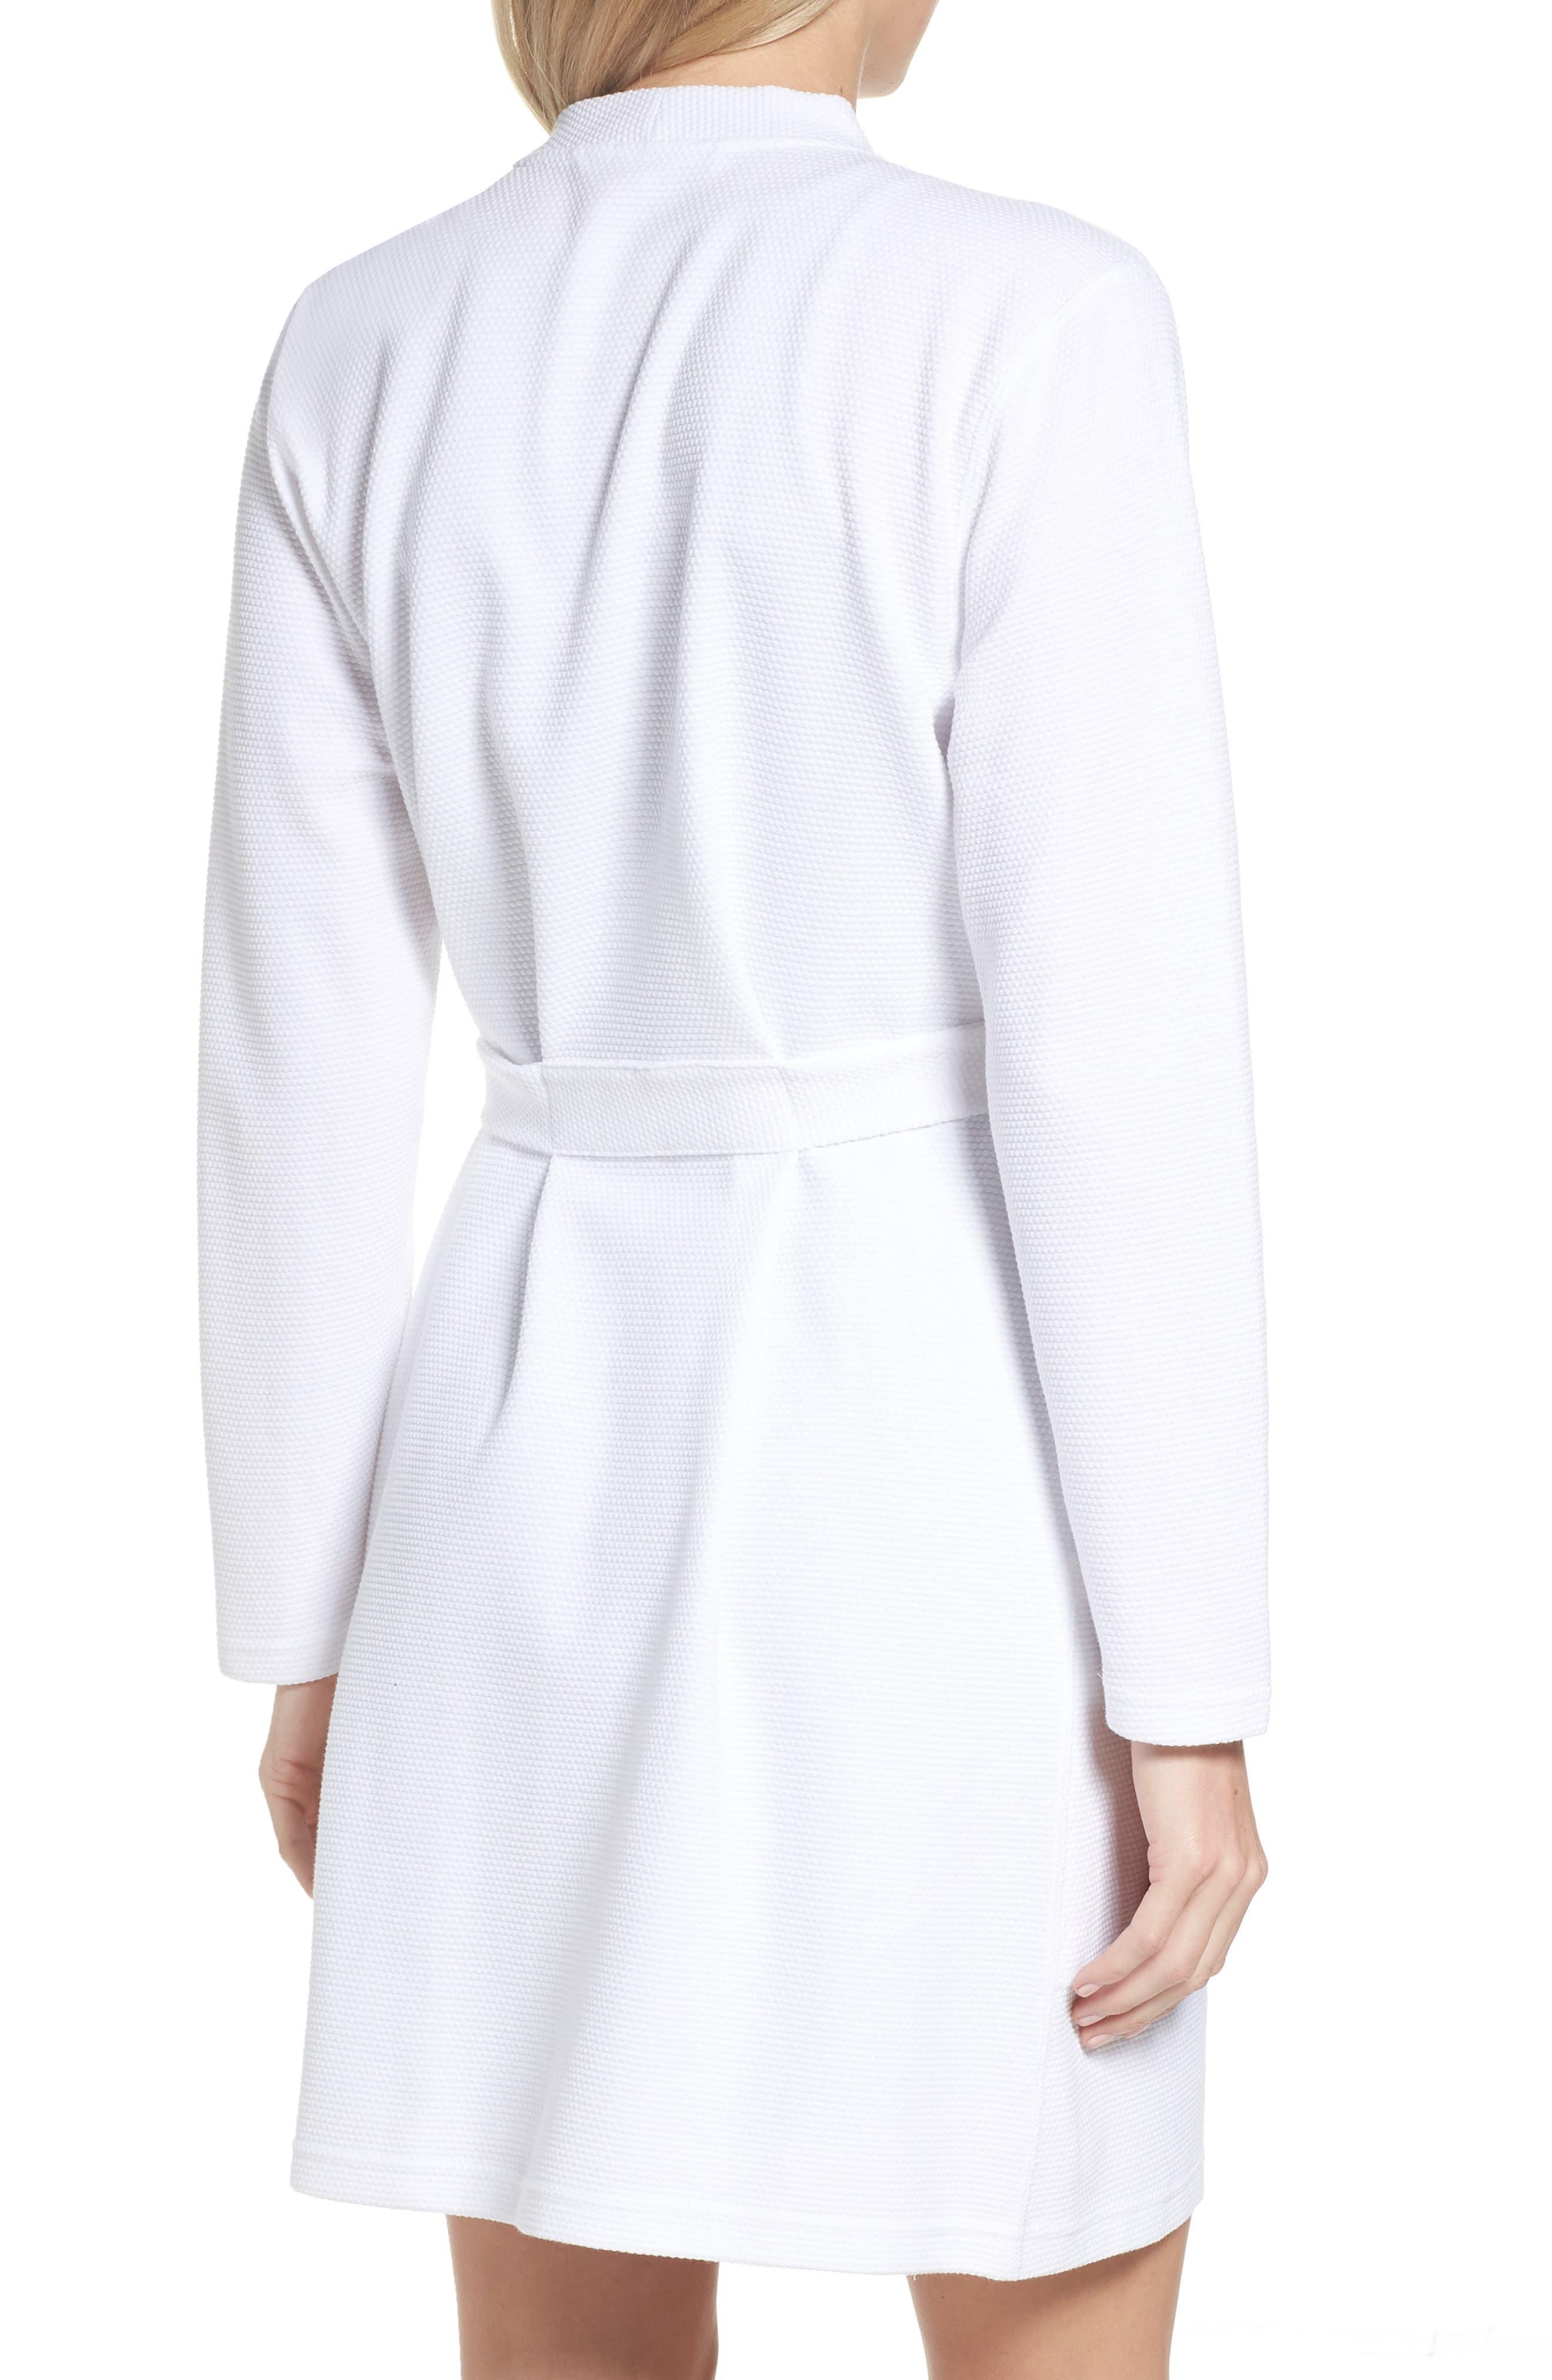 Short Robe,                             Alternate thumbnail 2, color,                             100